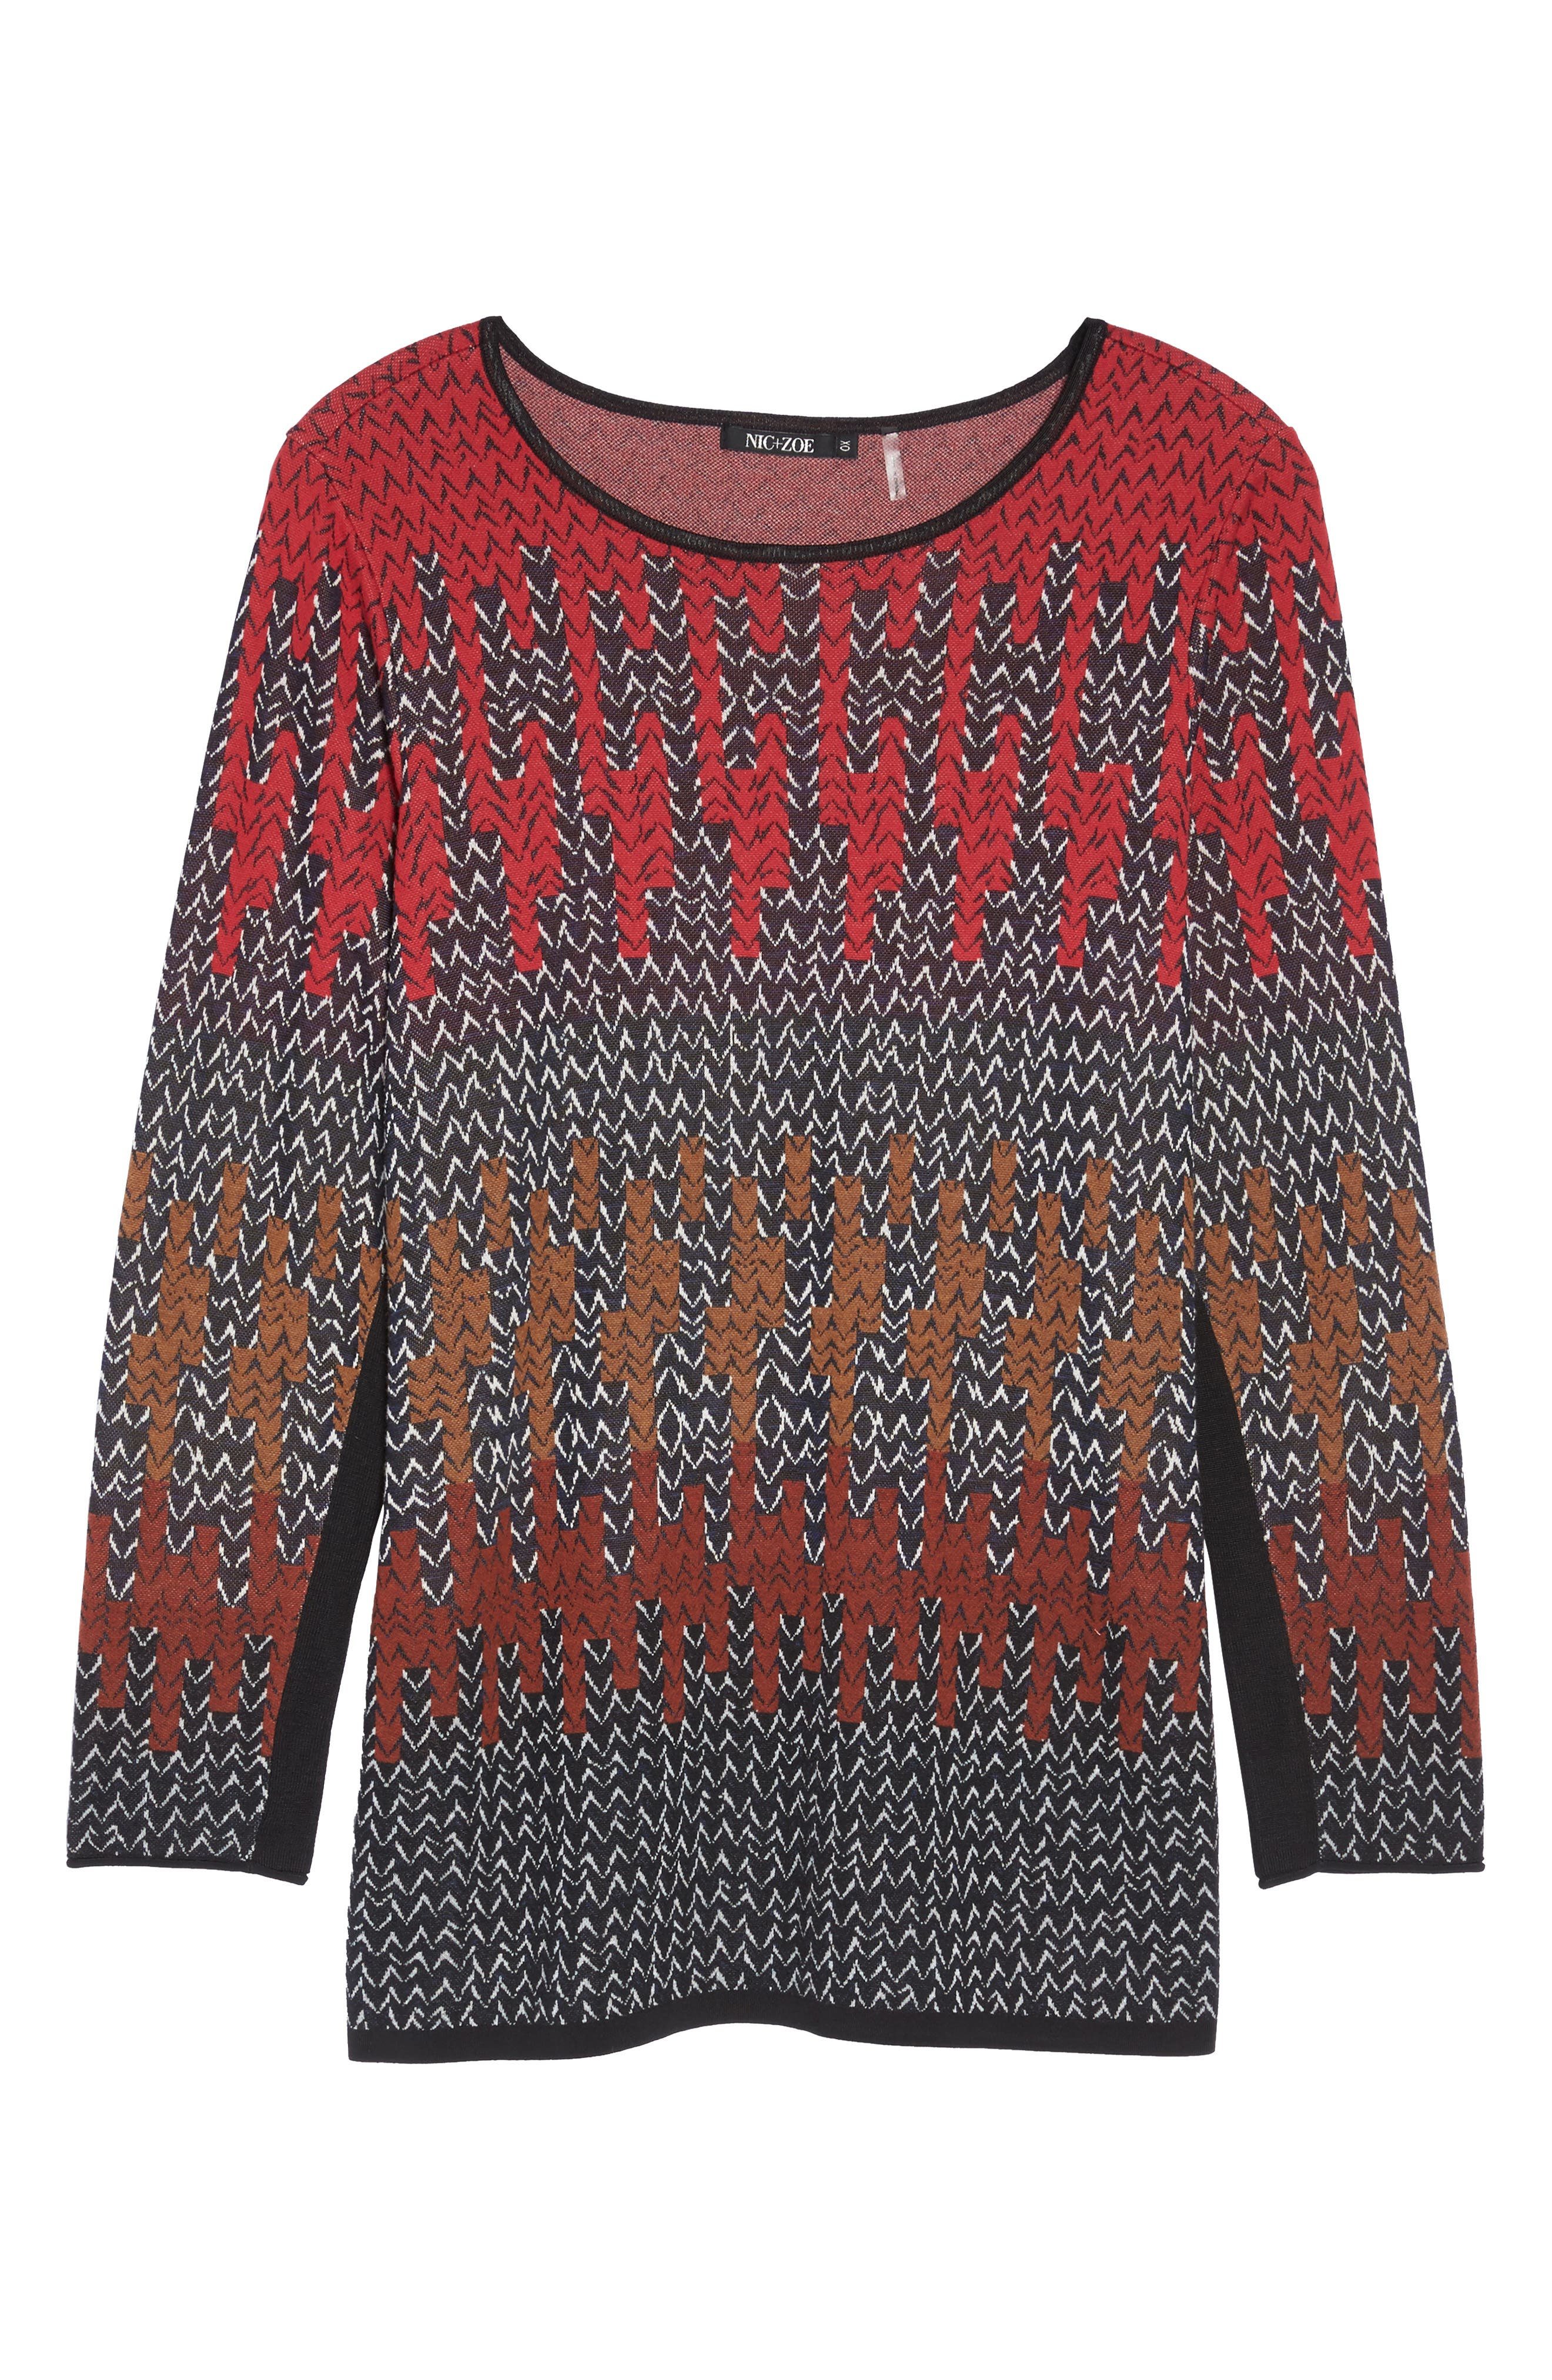 Sunset Sweater,                             Alternate thumbnail 12, color,